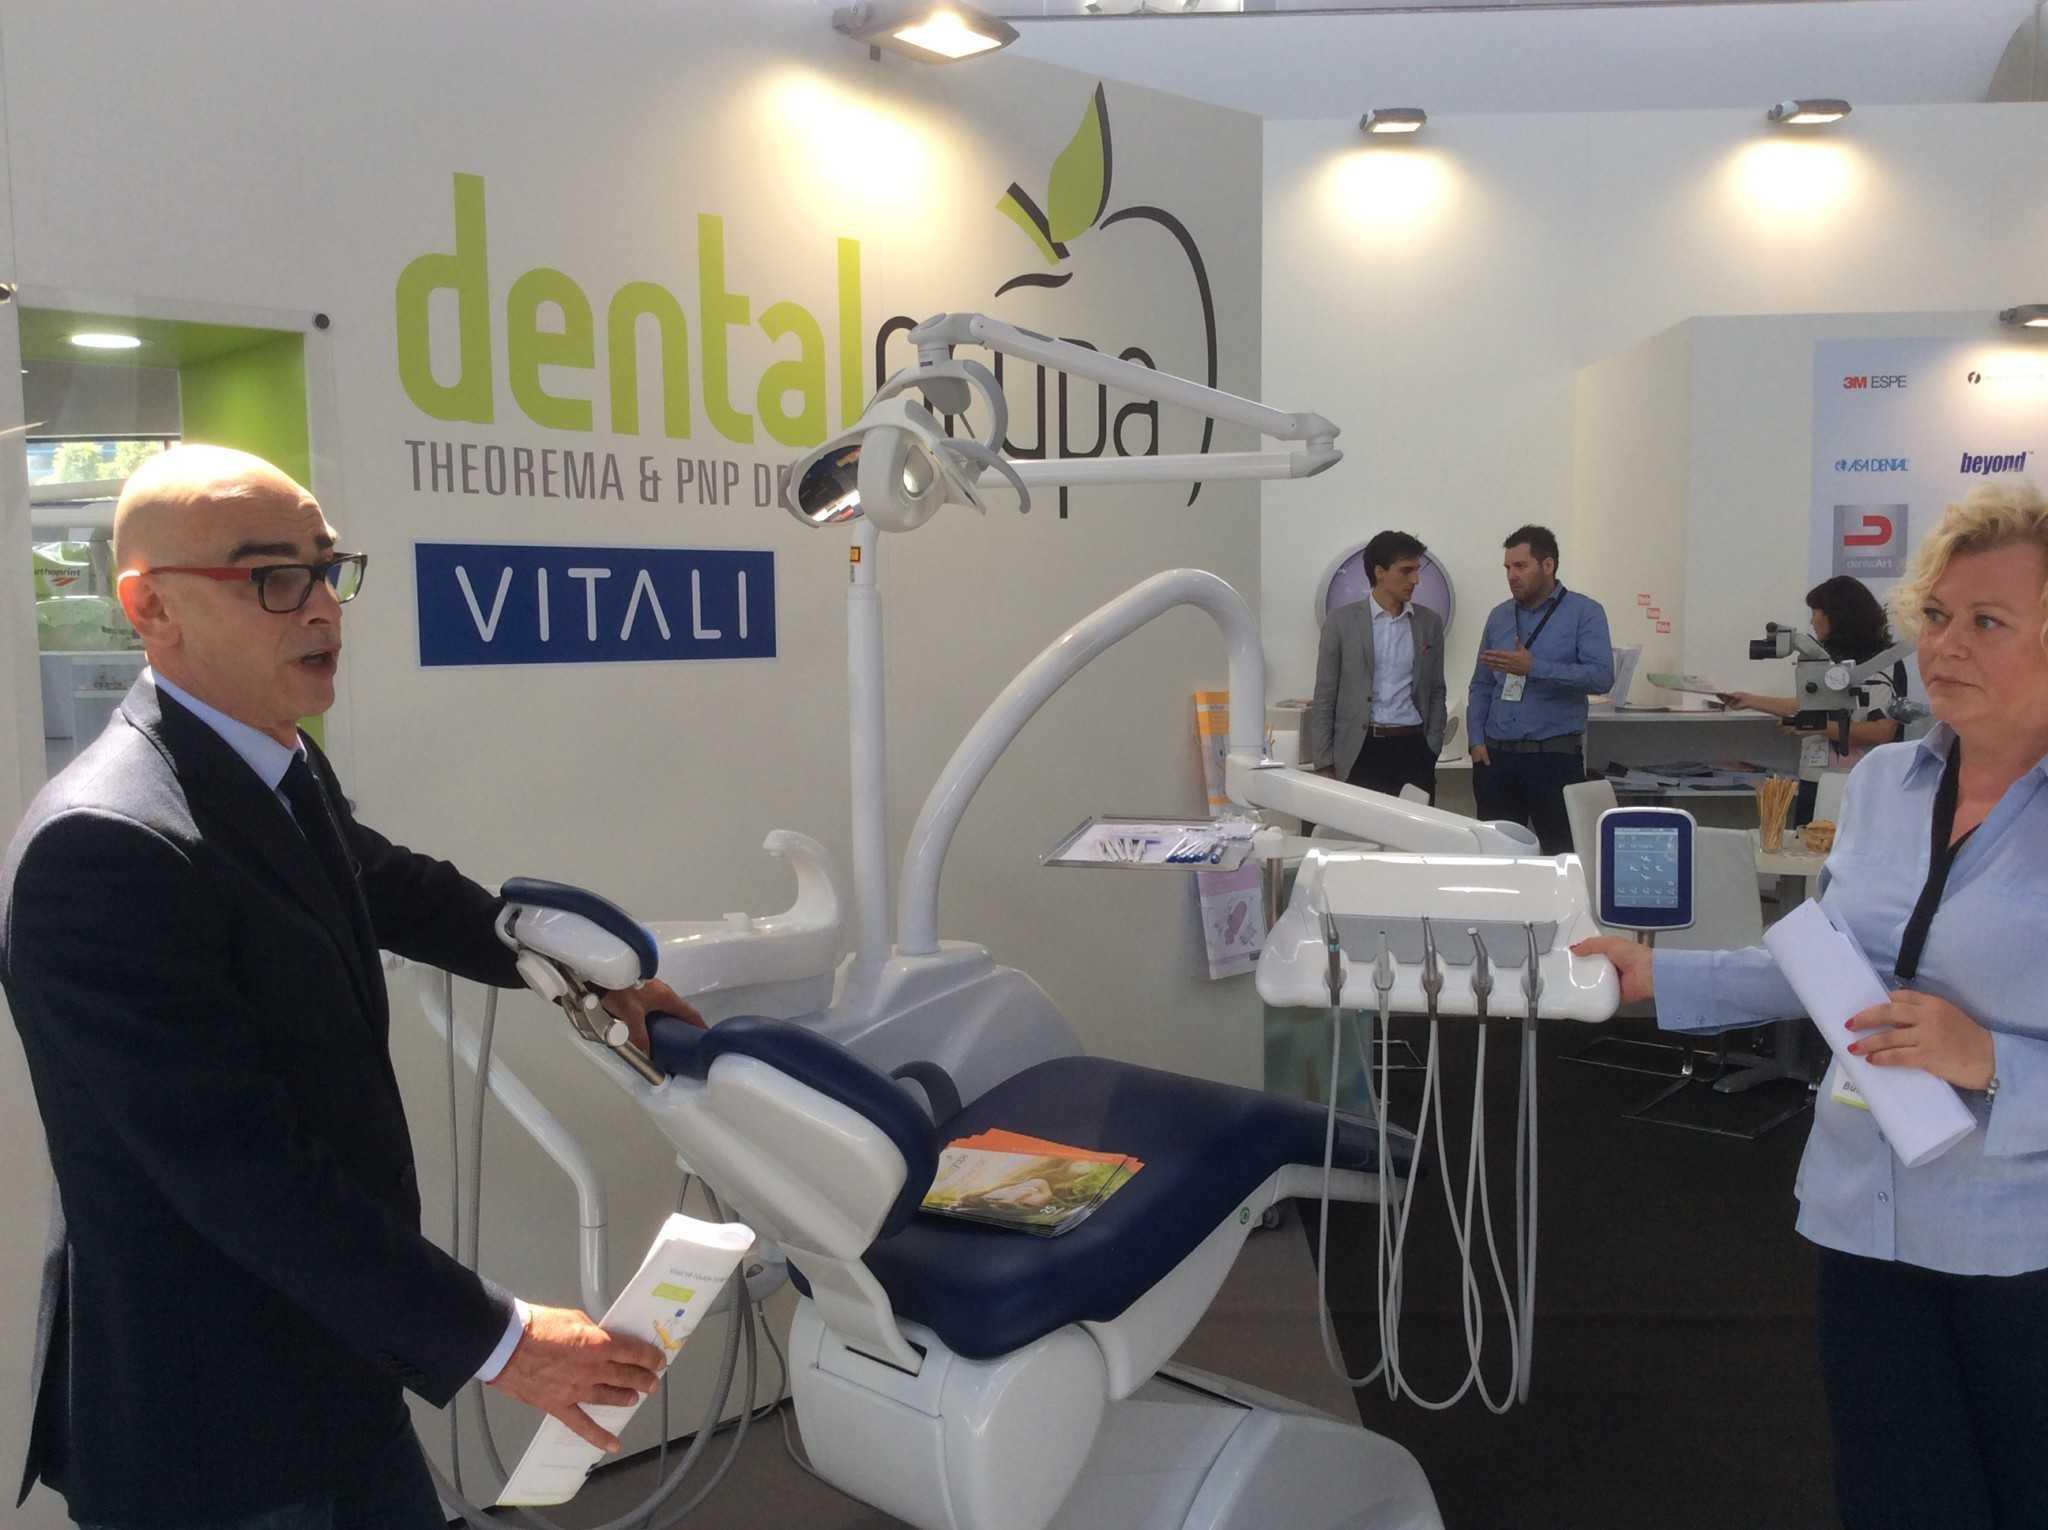 Vitali srl Dentex 2016